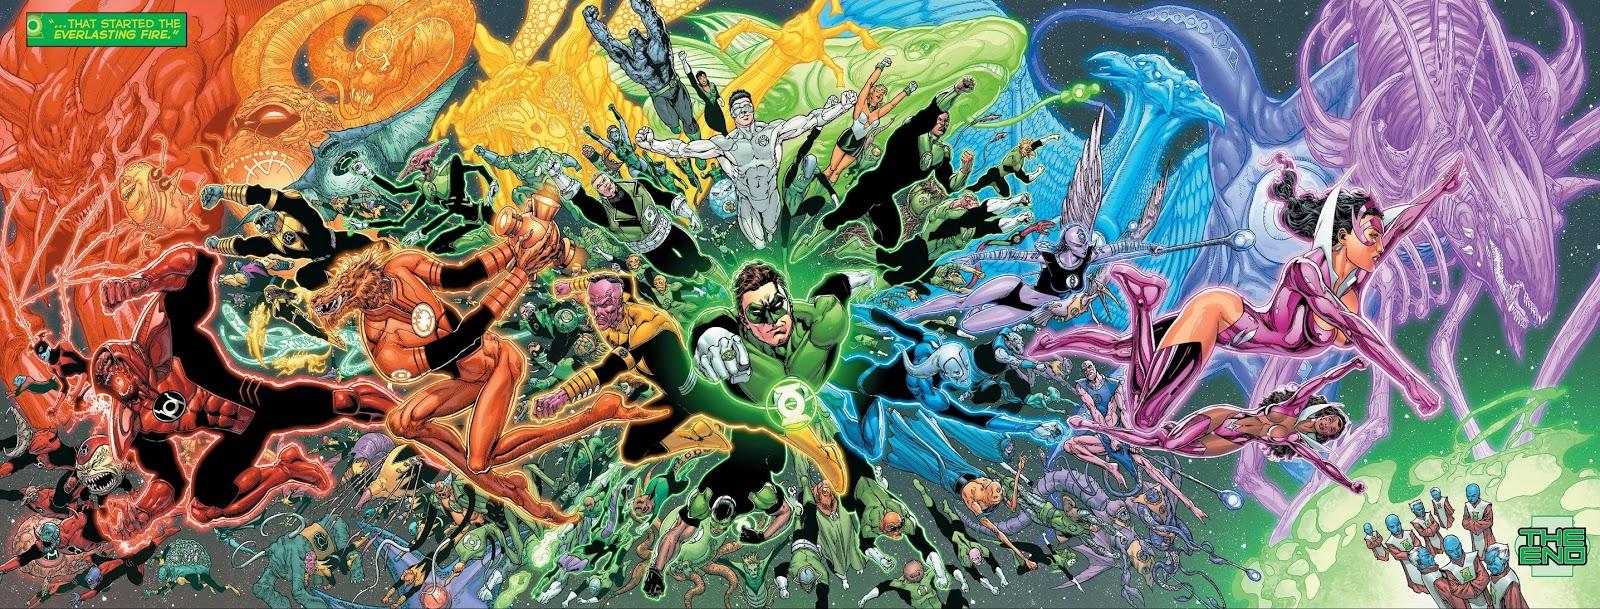 2013-05-22 07-49-42 - Green Lantern (2011-) 020-059